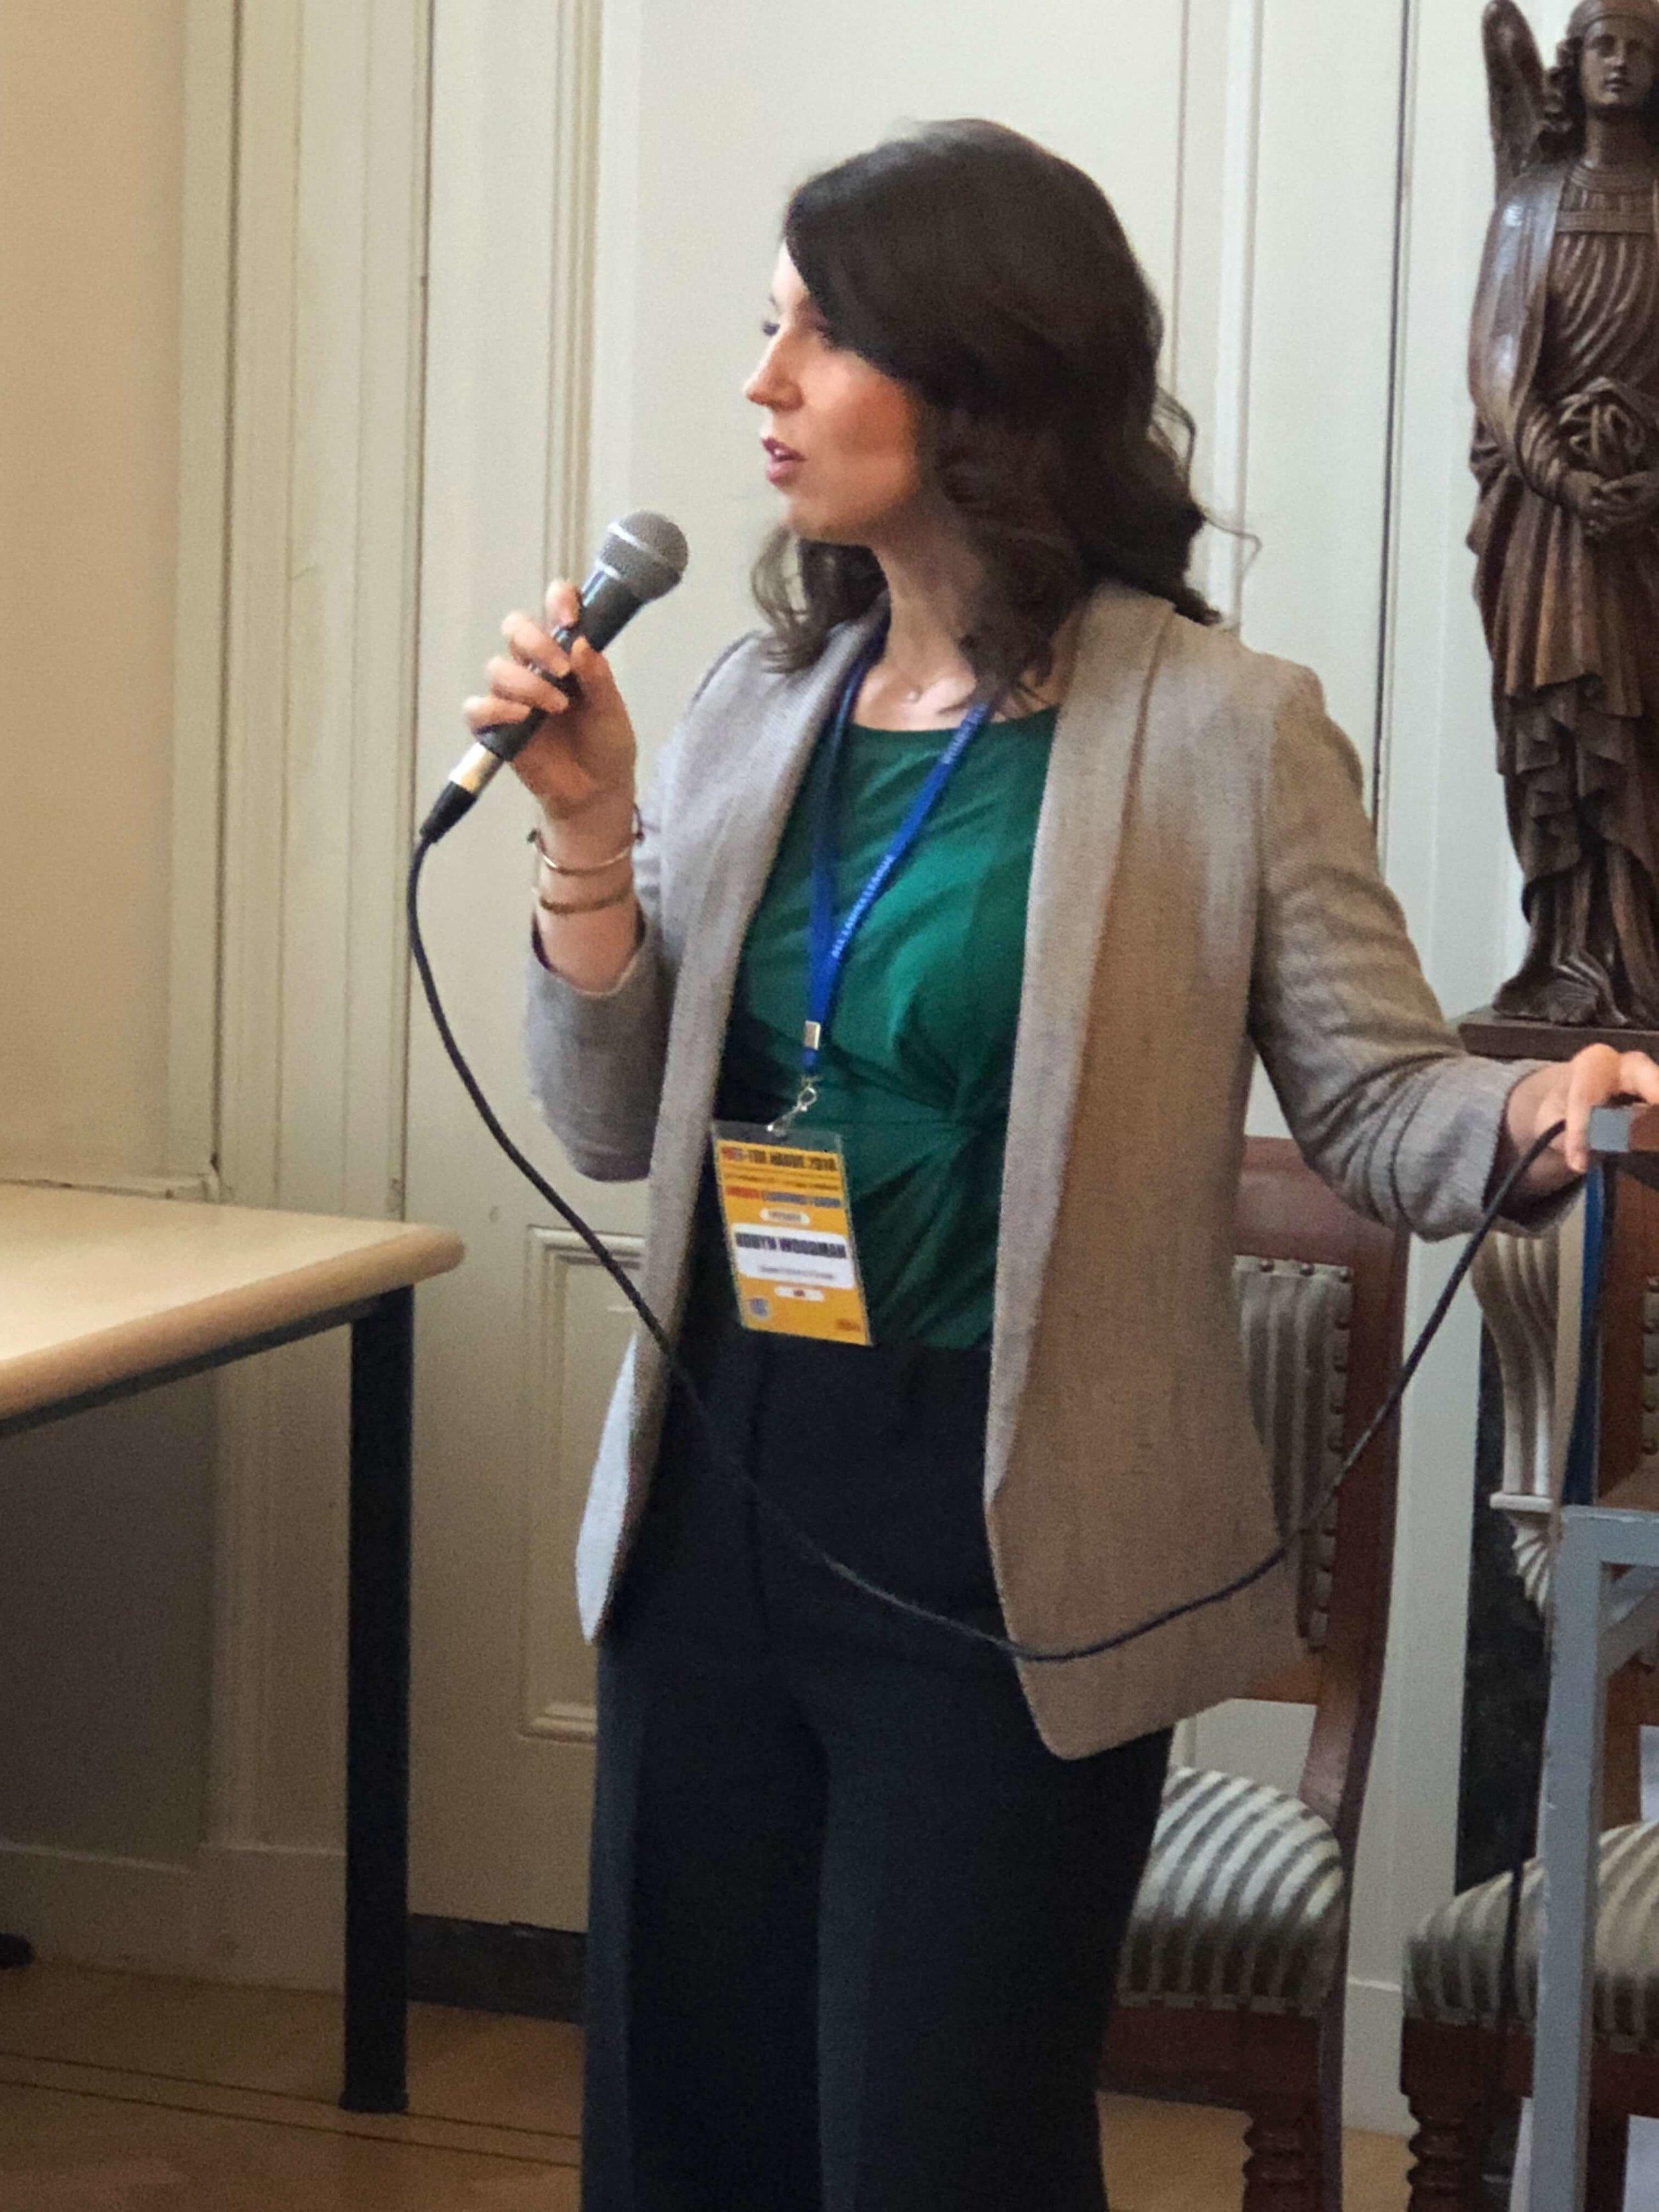 Robyn-woodman-hatch-tribe-members-circle-female-business-entrepreneur